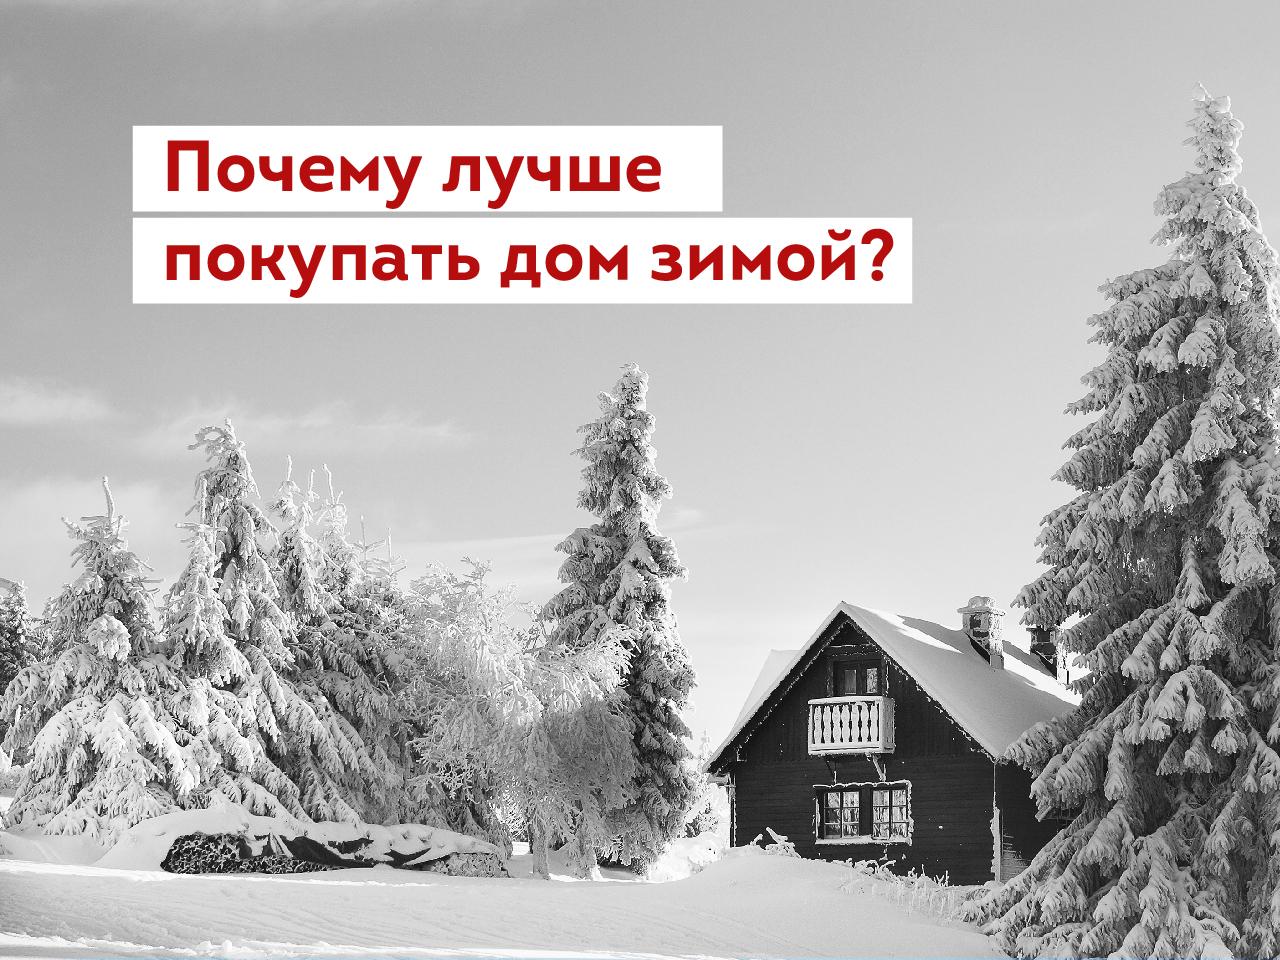 дом зимой1.jpg